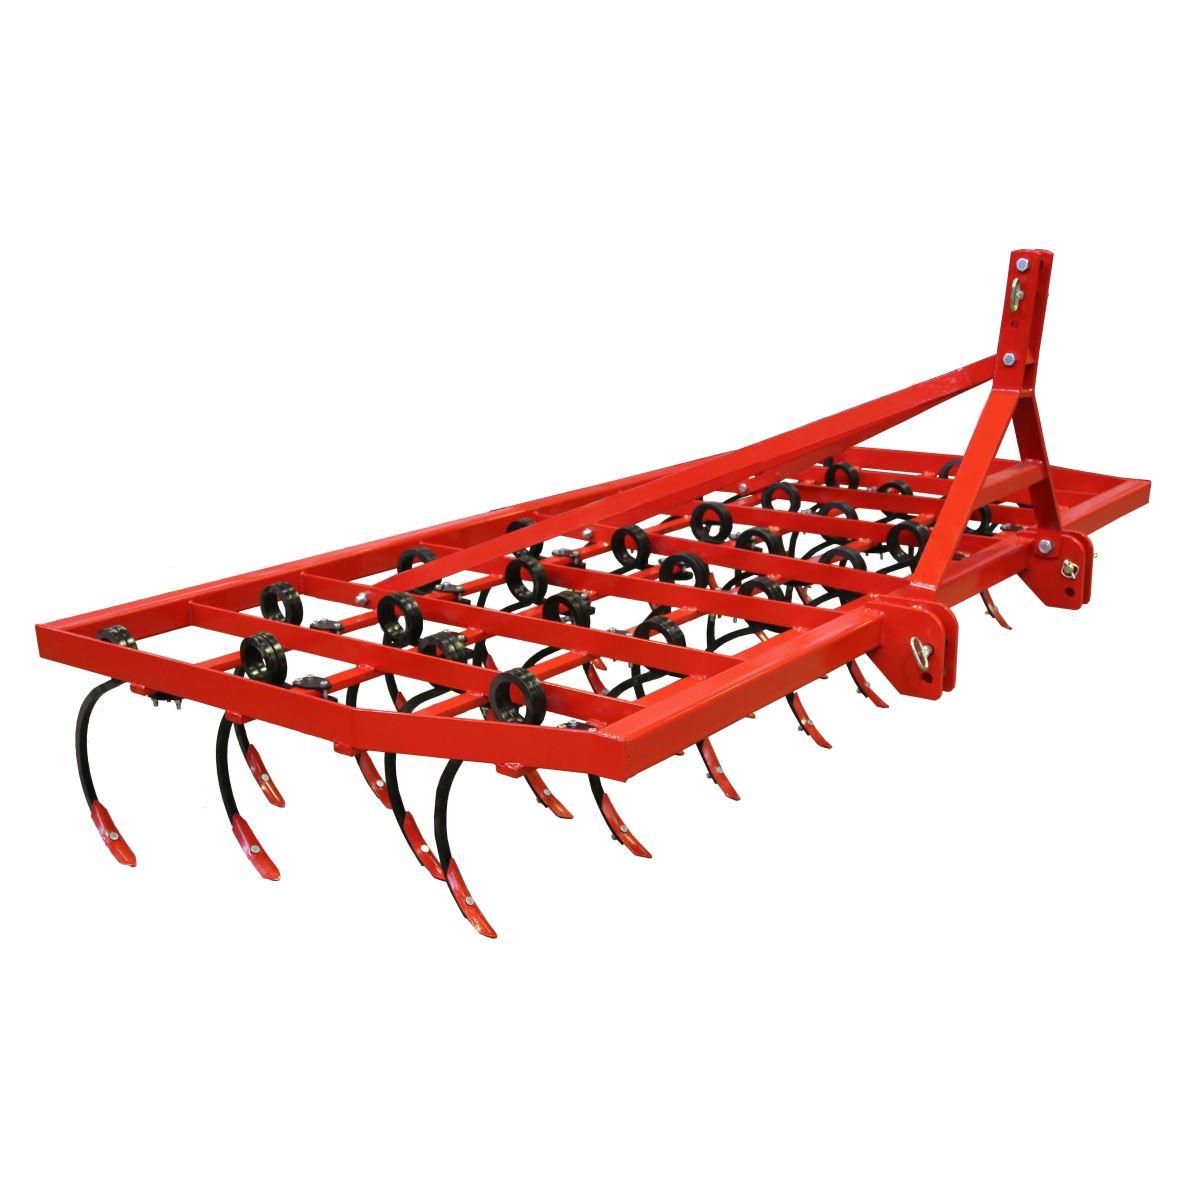 انواع کولتیواتور-فروش کولتیواتور-دستگاه کولتیواتور چیست-قیمت کولتیواتور باغی-کولتیواتور مزرعه